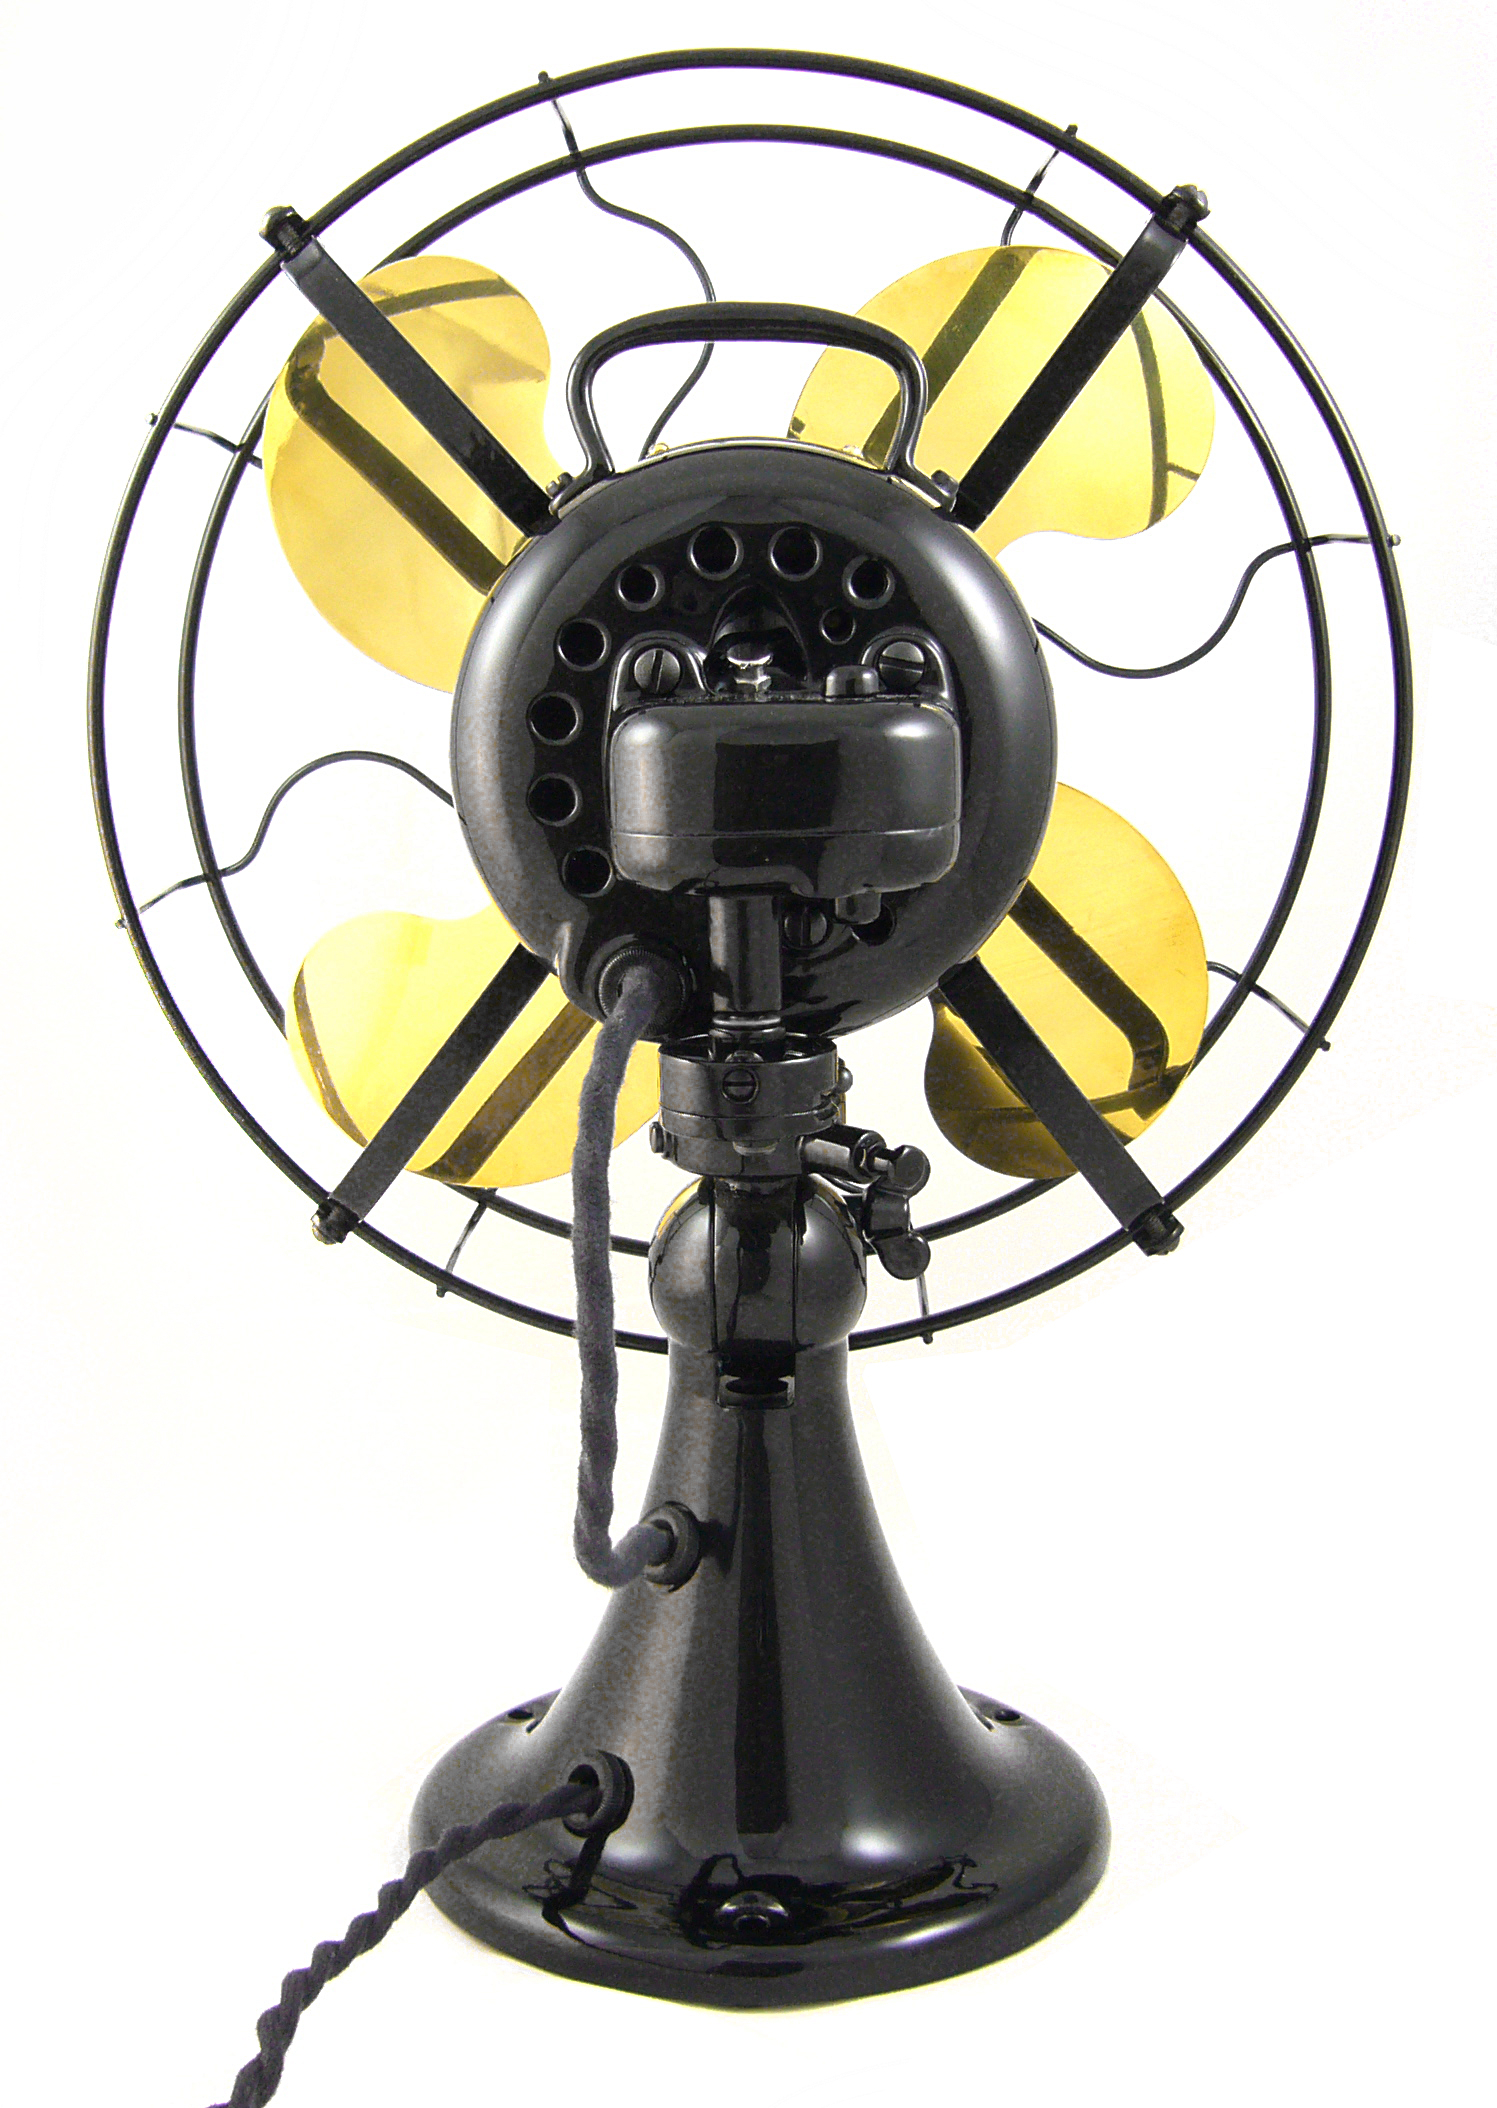 1918 Emerson Electric Fan Restoration